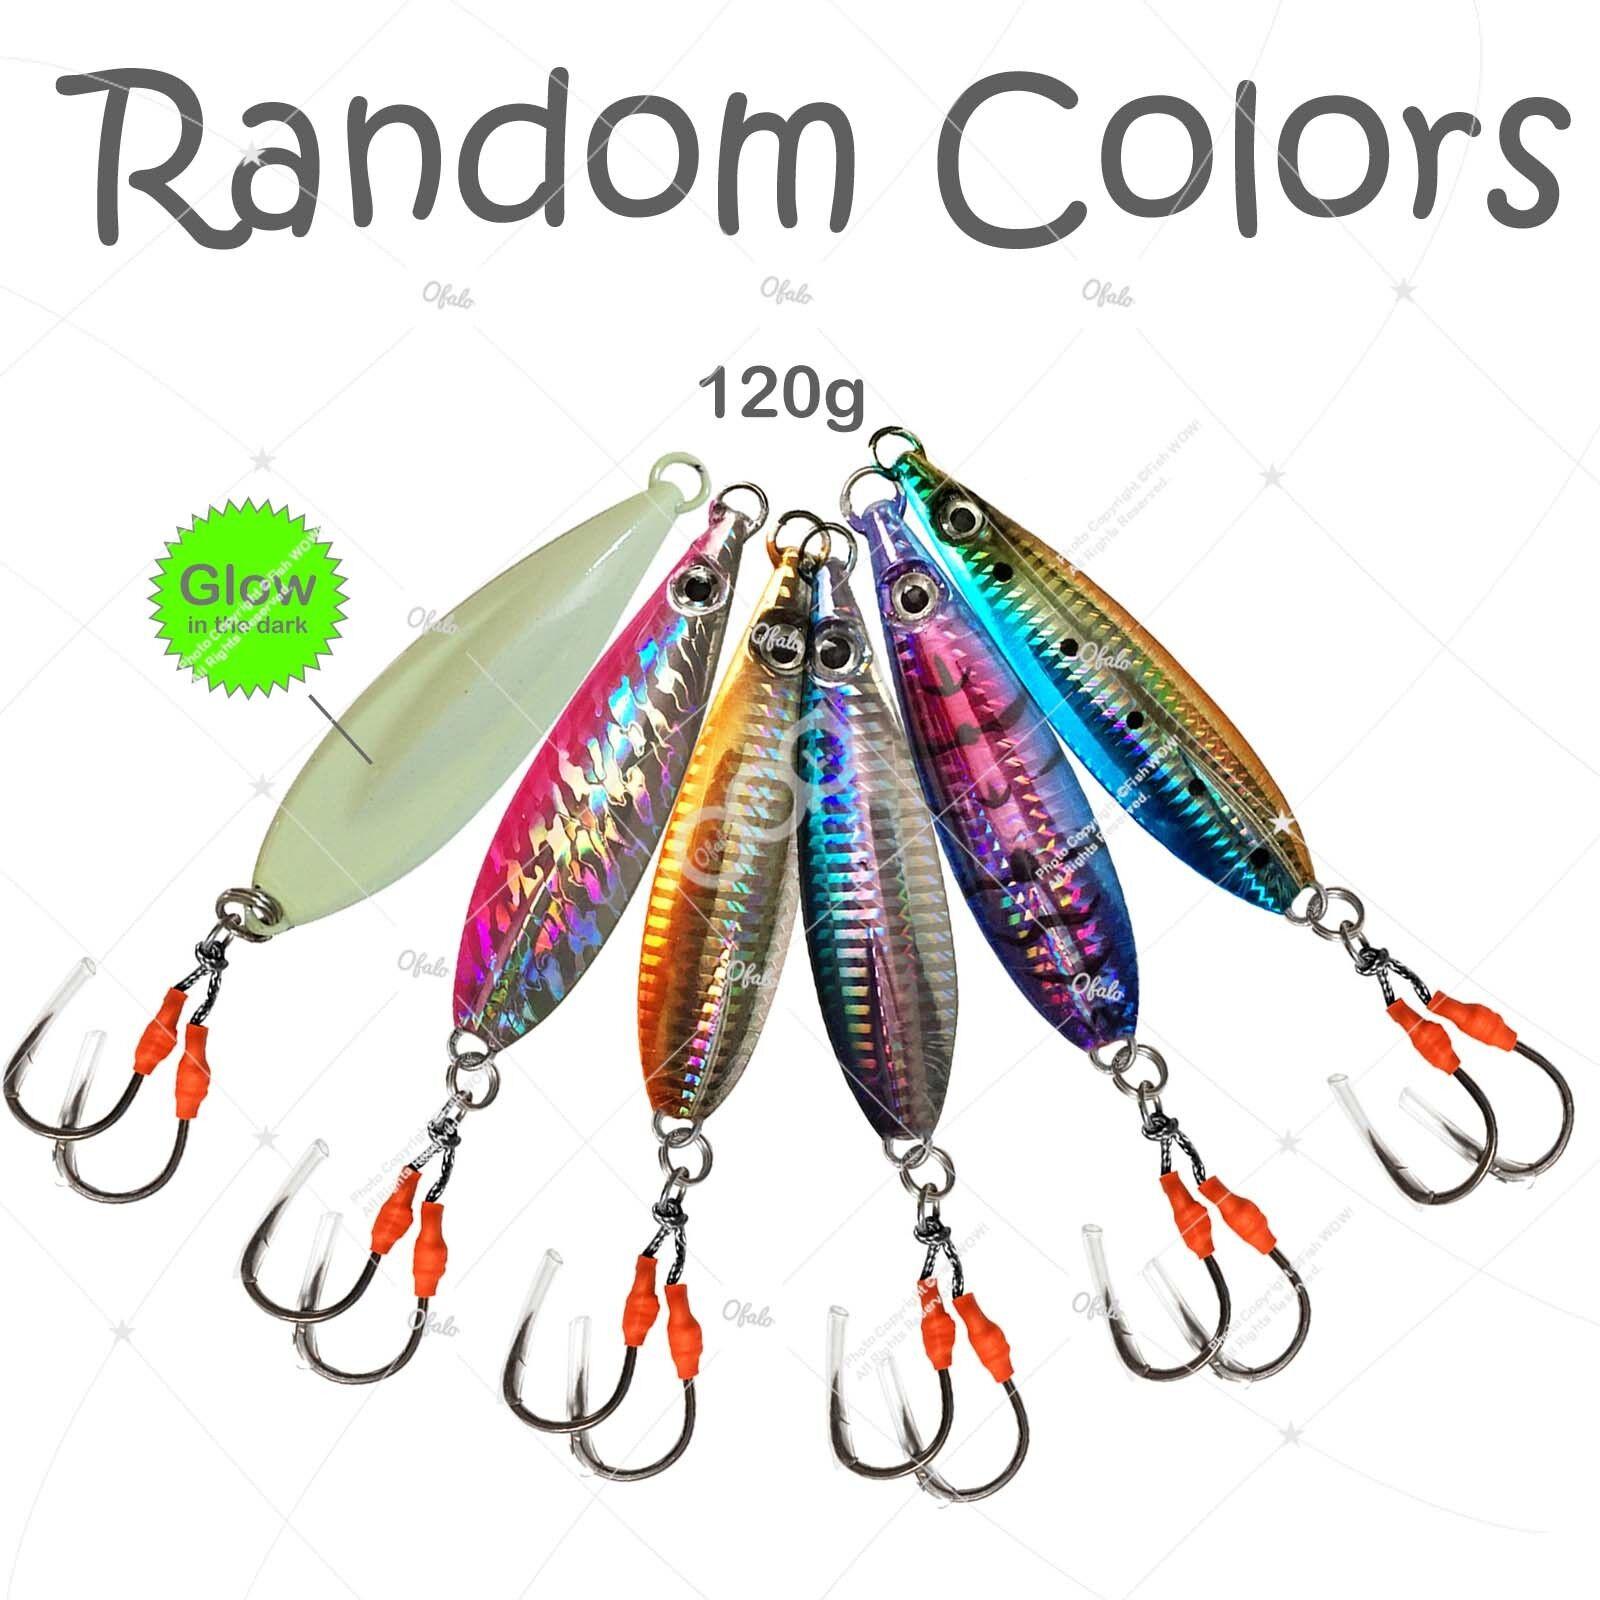 5pcs 120g Fishing Flat Fish Jig 4.2oz Speed greenical Metal Lure jig Random color